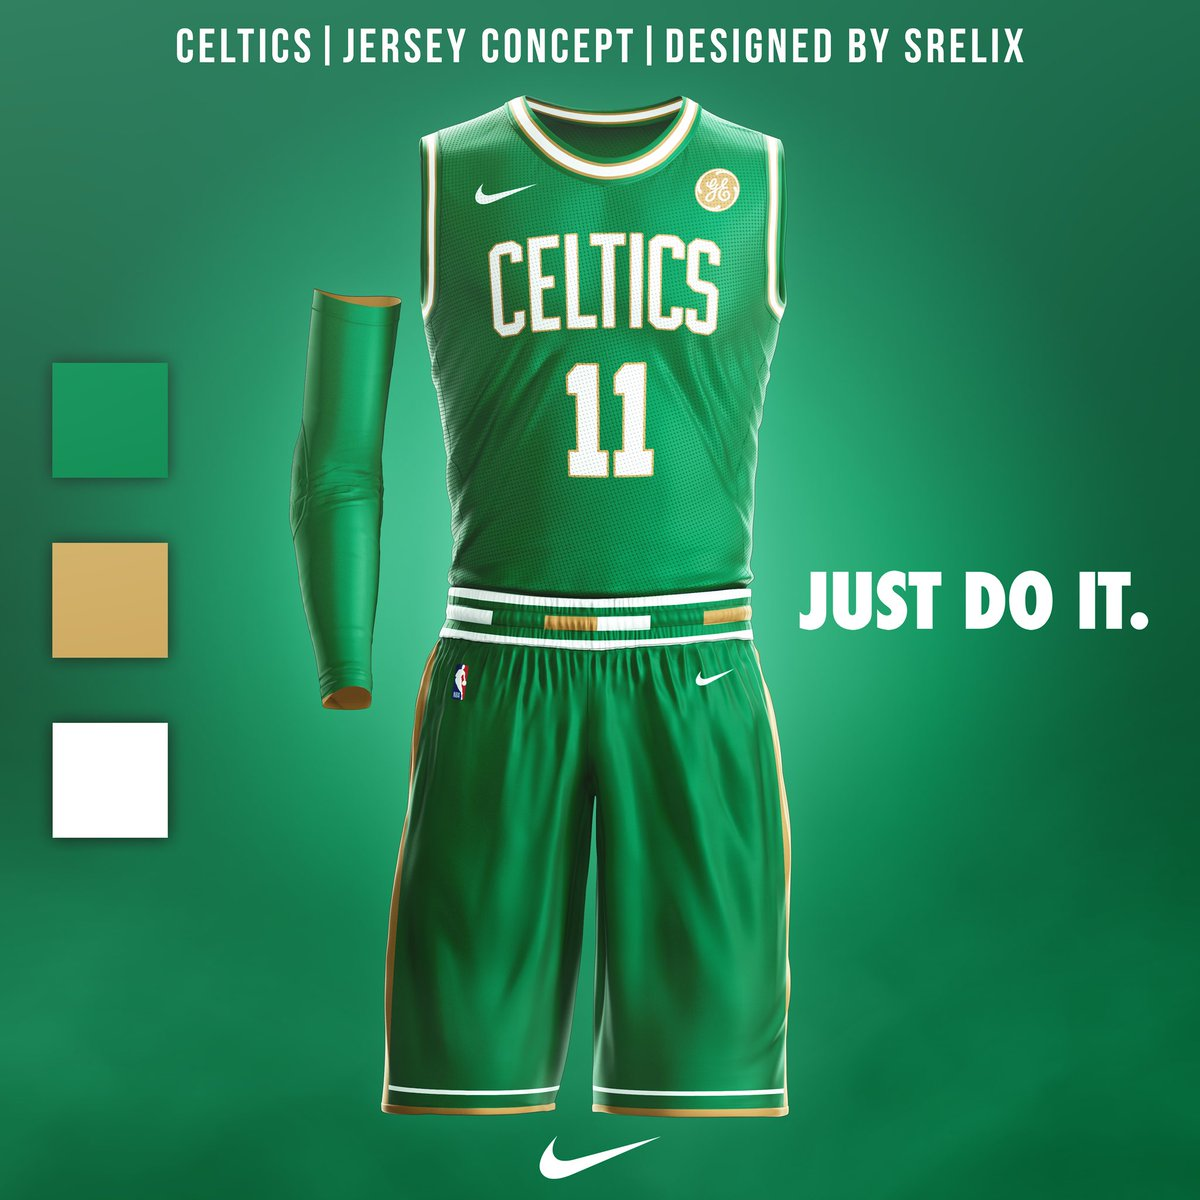 Mikey Halim On Twitter Boston Celtics Jersey Concept Follow Me On Instagram Srelix For More Celtics Celtics Bostonceltics